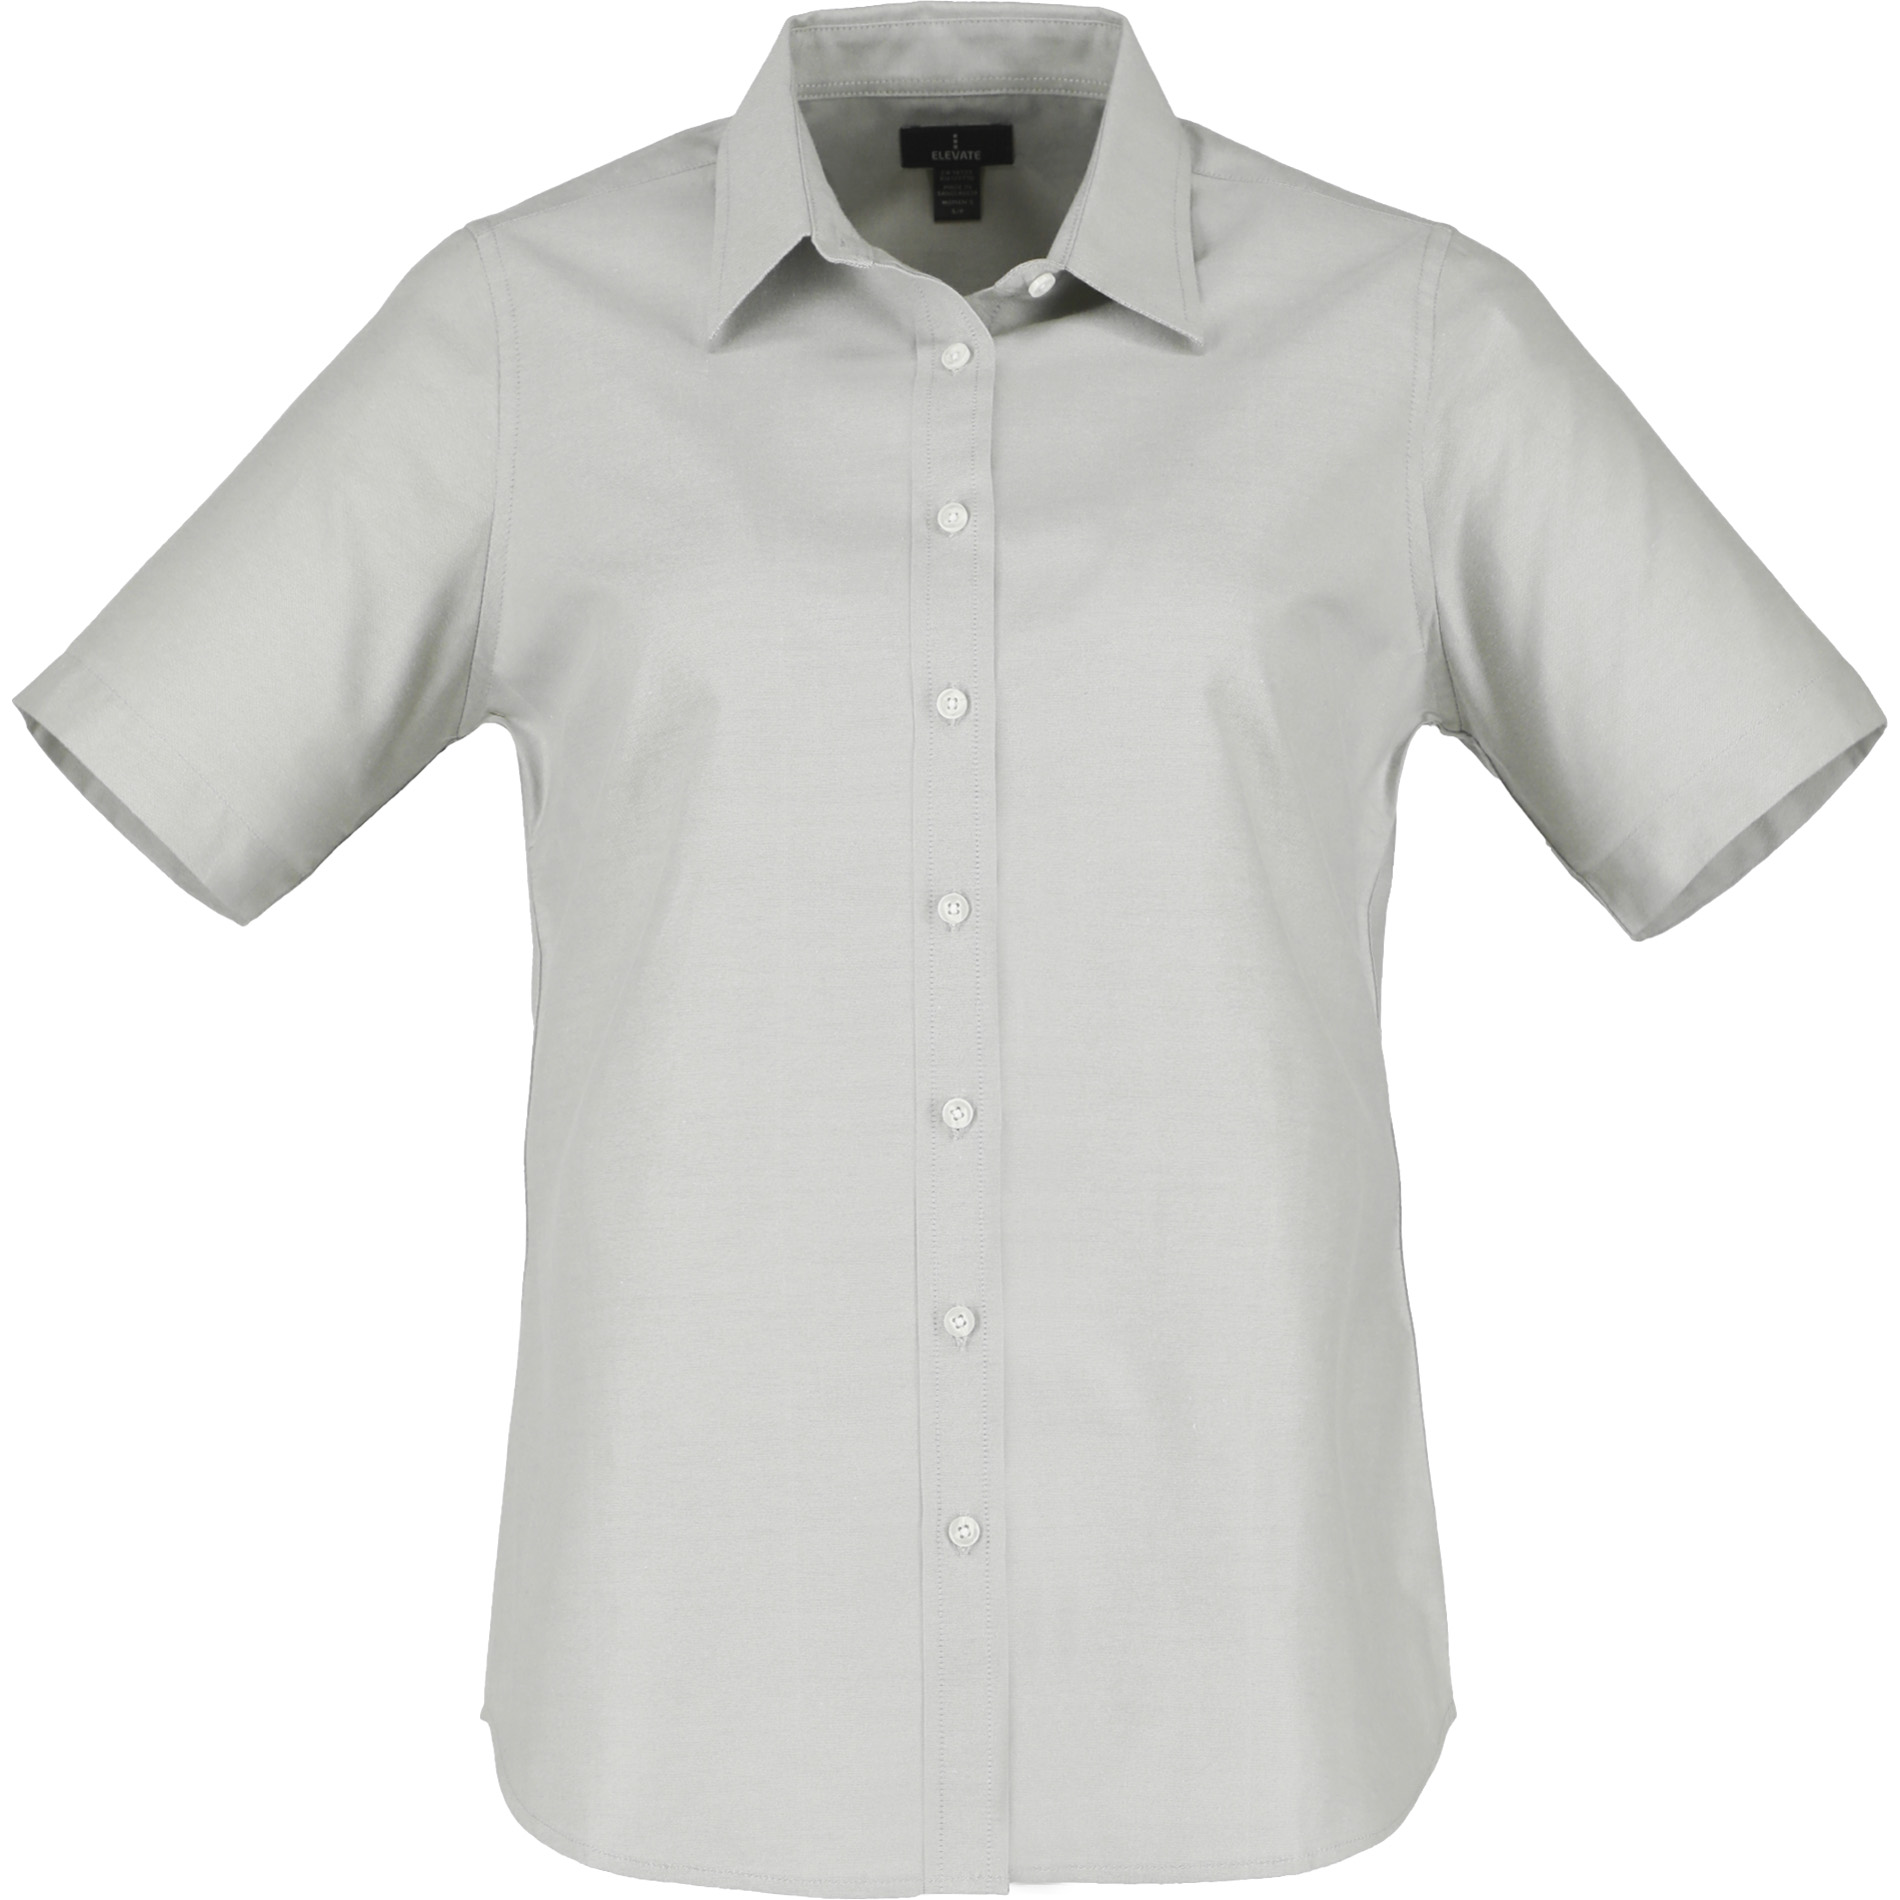 Elevate TM97702 - Women's SAMSON Oxford Short Sleeve ...